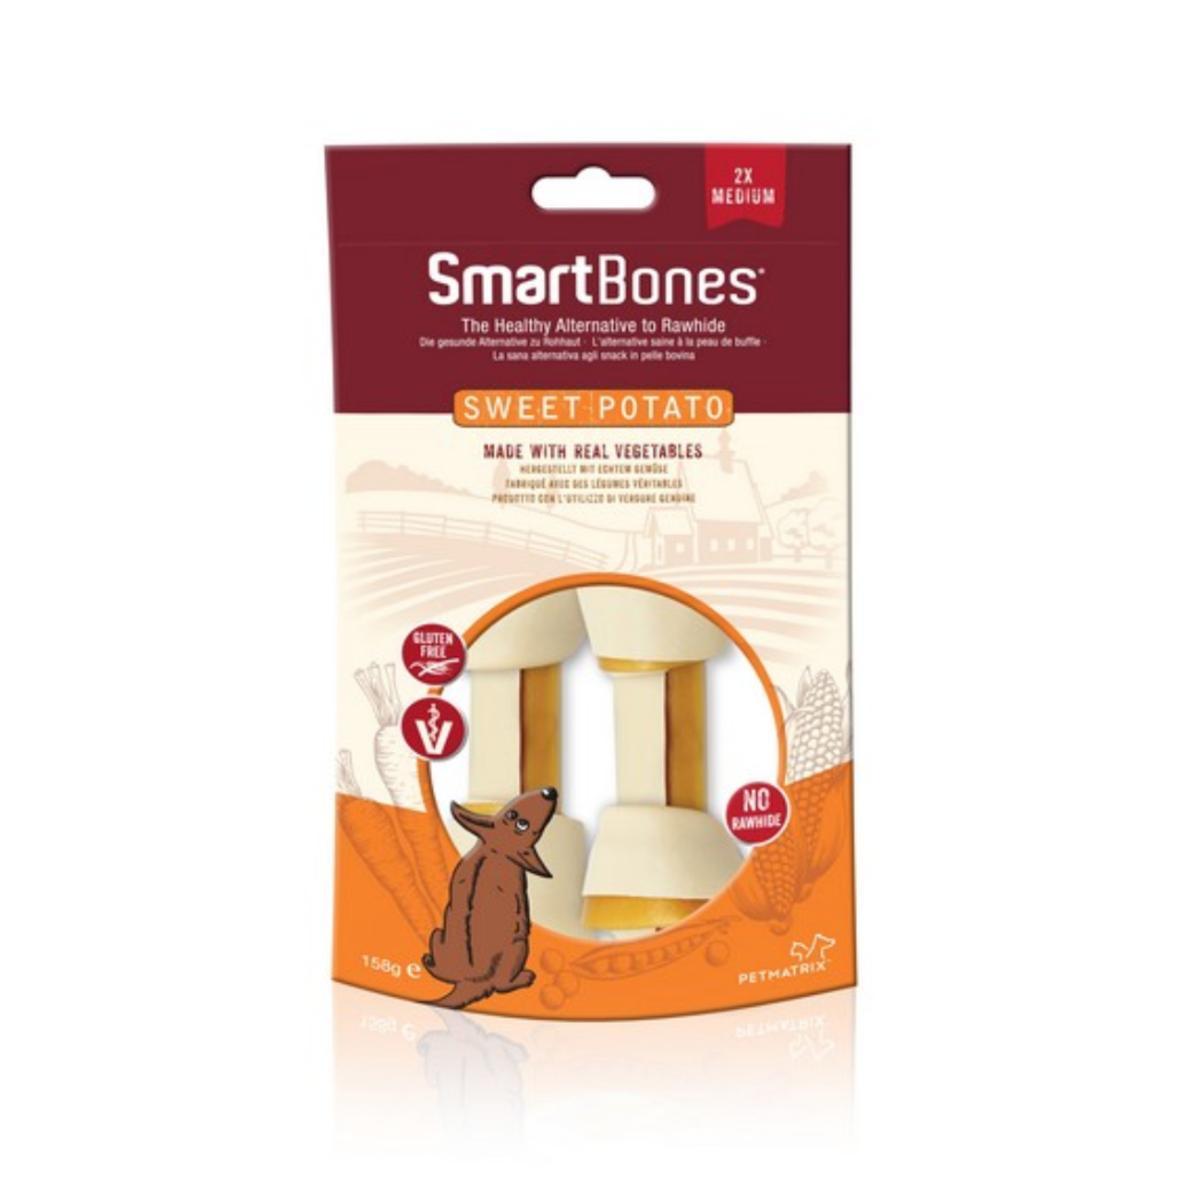 CLEARANCE SmartBones Medium Chews Sweet Potato 2pcs